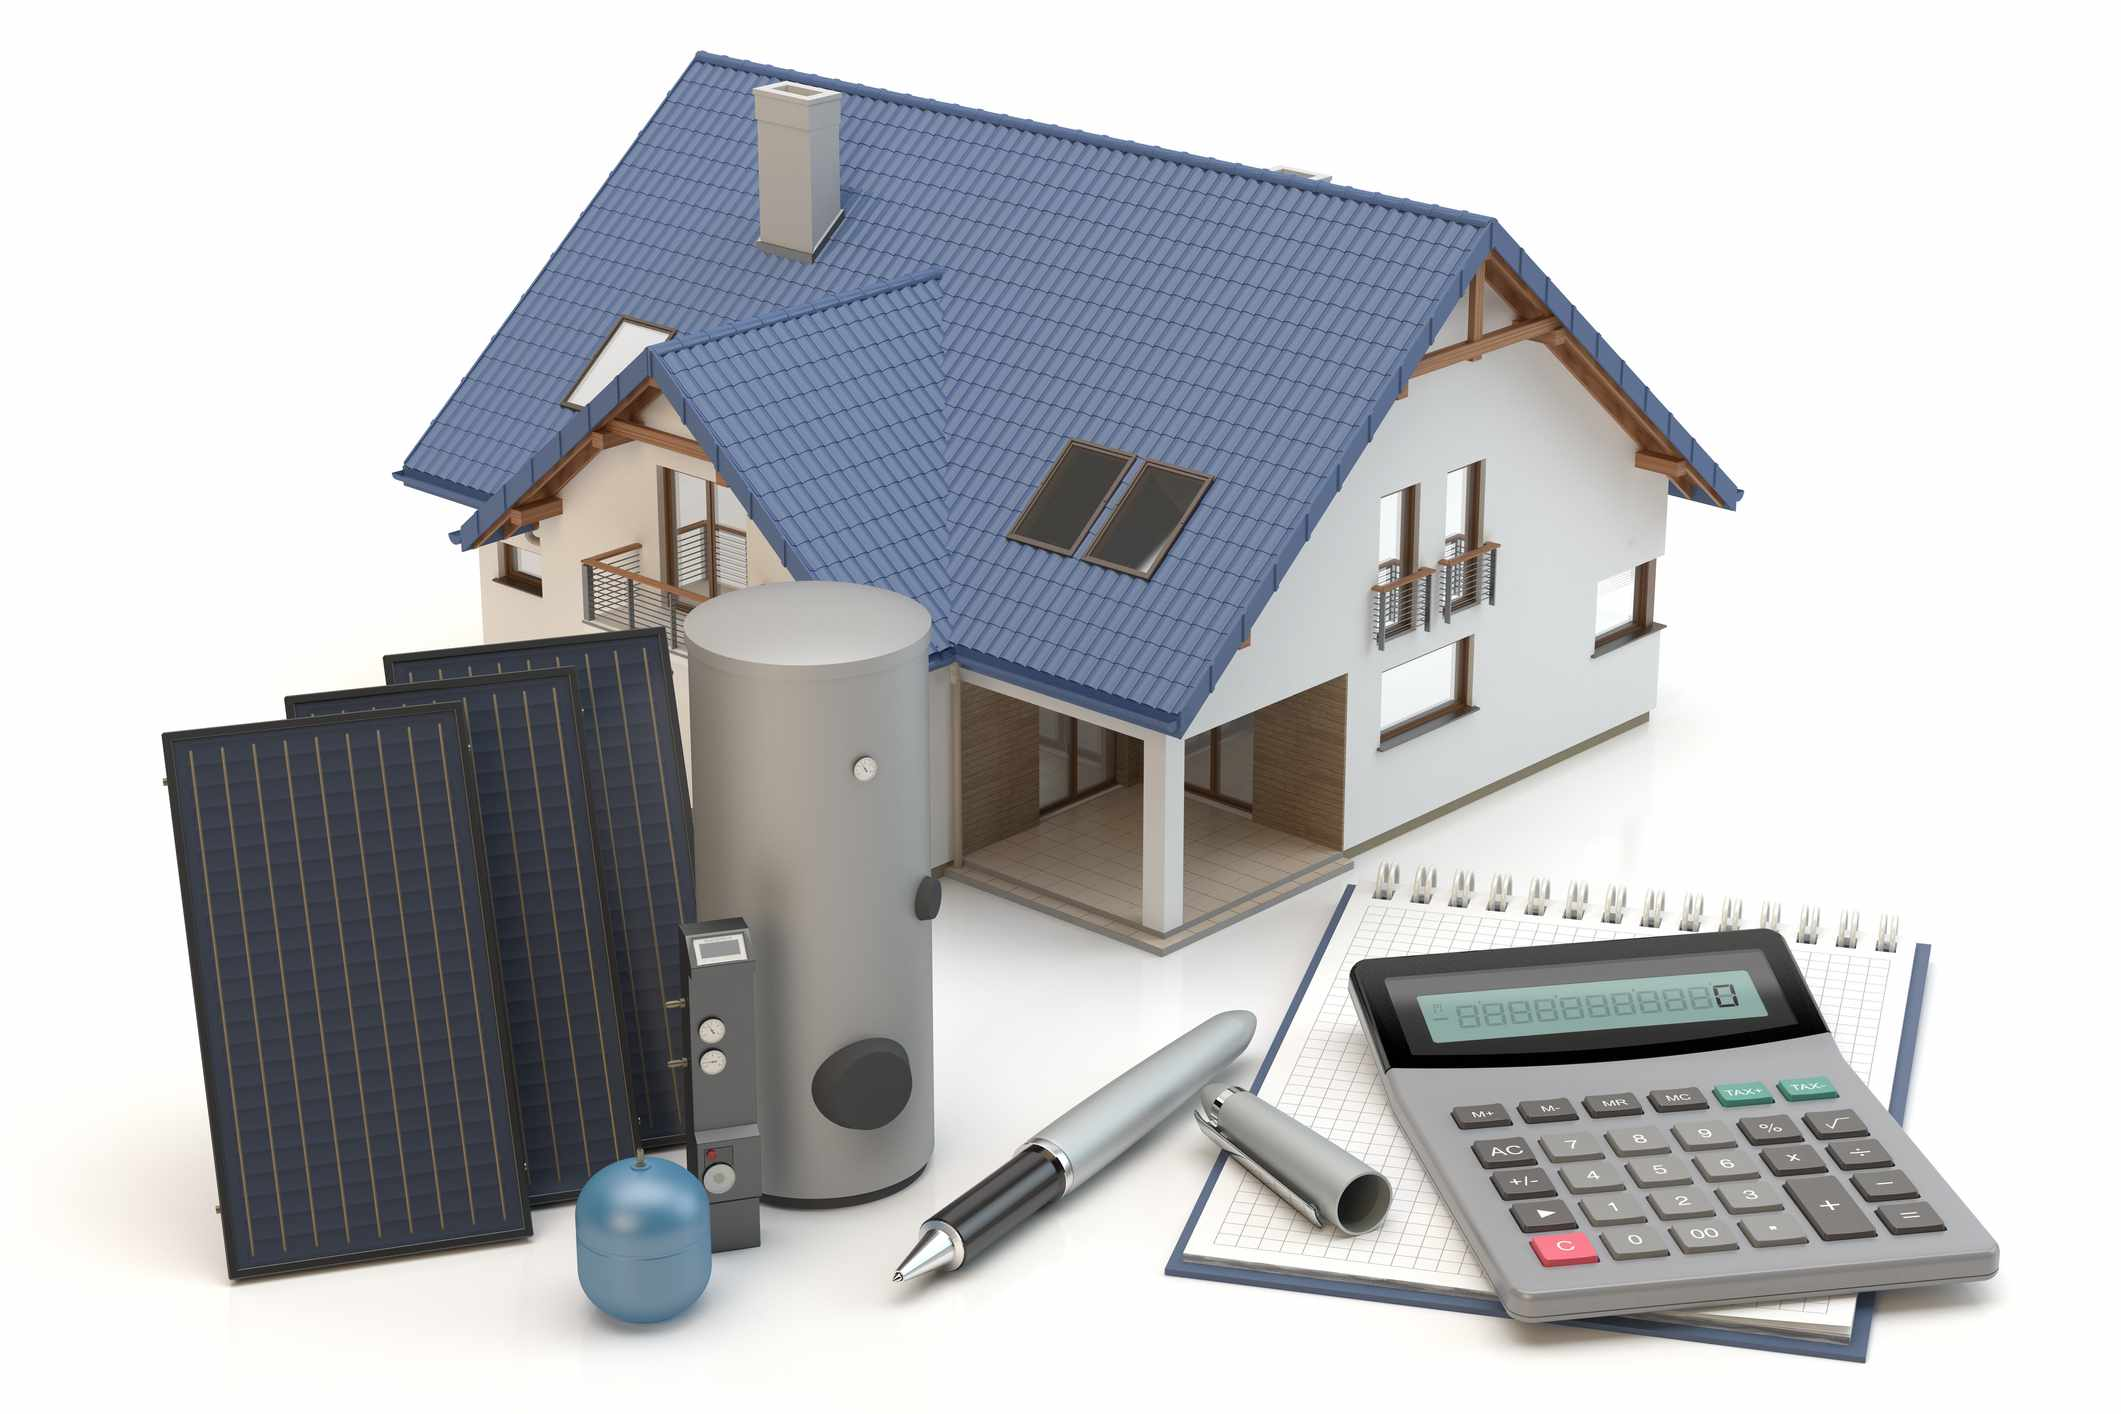 Solar panel investment calculator